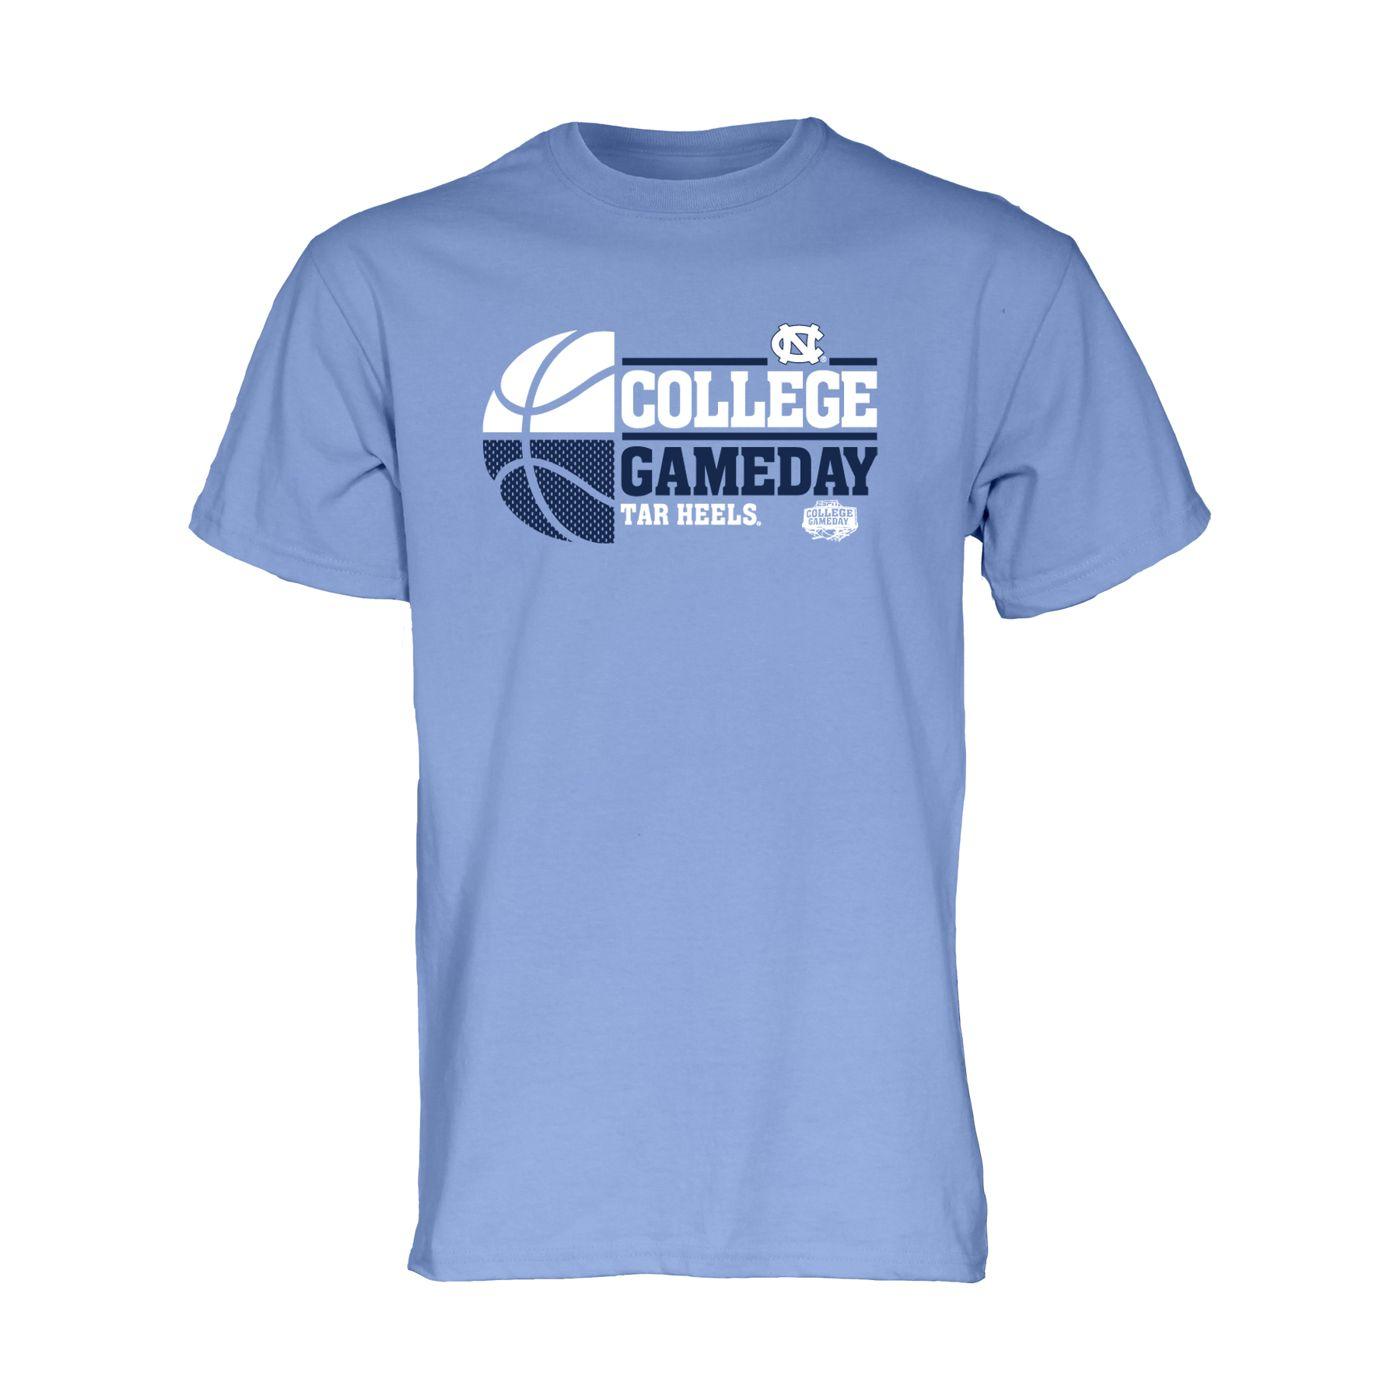 johnny t shirt north carolina tar heels basketball espn college gameday basketball t cb. Black Bedroom Furniture Sets. Home Design Ideas